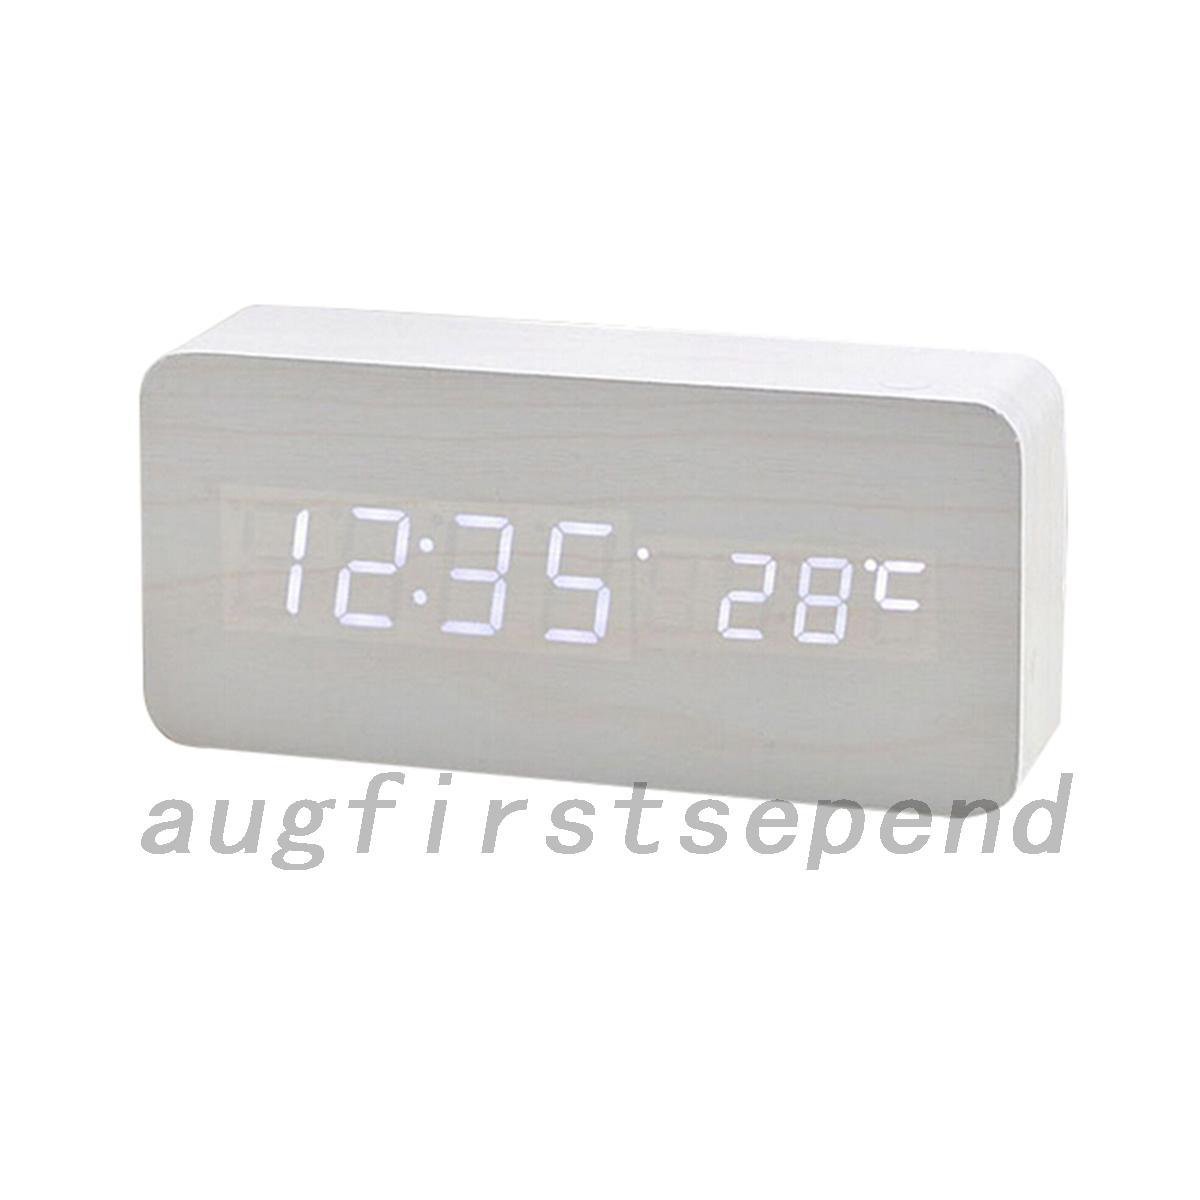 digital wanduhr stranduhr uhr wecker holz mdf pvc led ziffern thermometer ebay. Black Bedroom Furniture Sets. Home Design Ideas